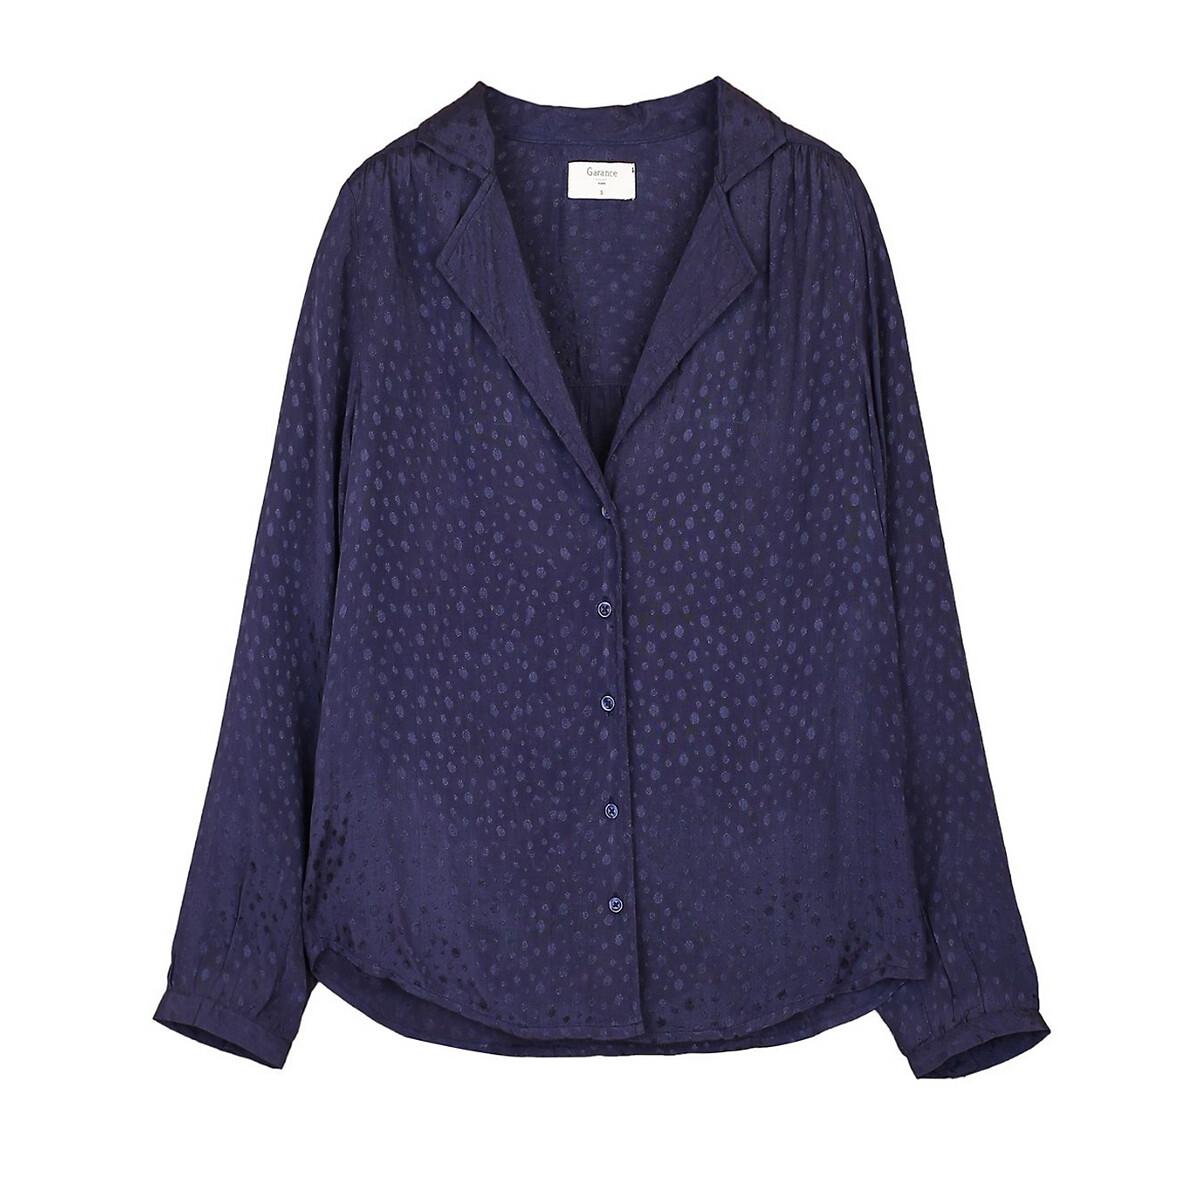 Блузка La Redoute Из струящейся ткани с длинными рукавами L синий блуза la redoute с рисунком и длинными рукавами s синий